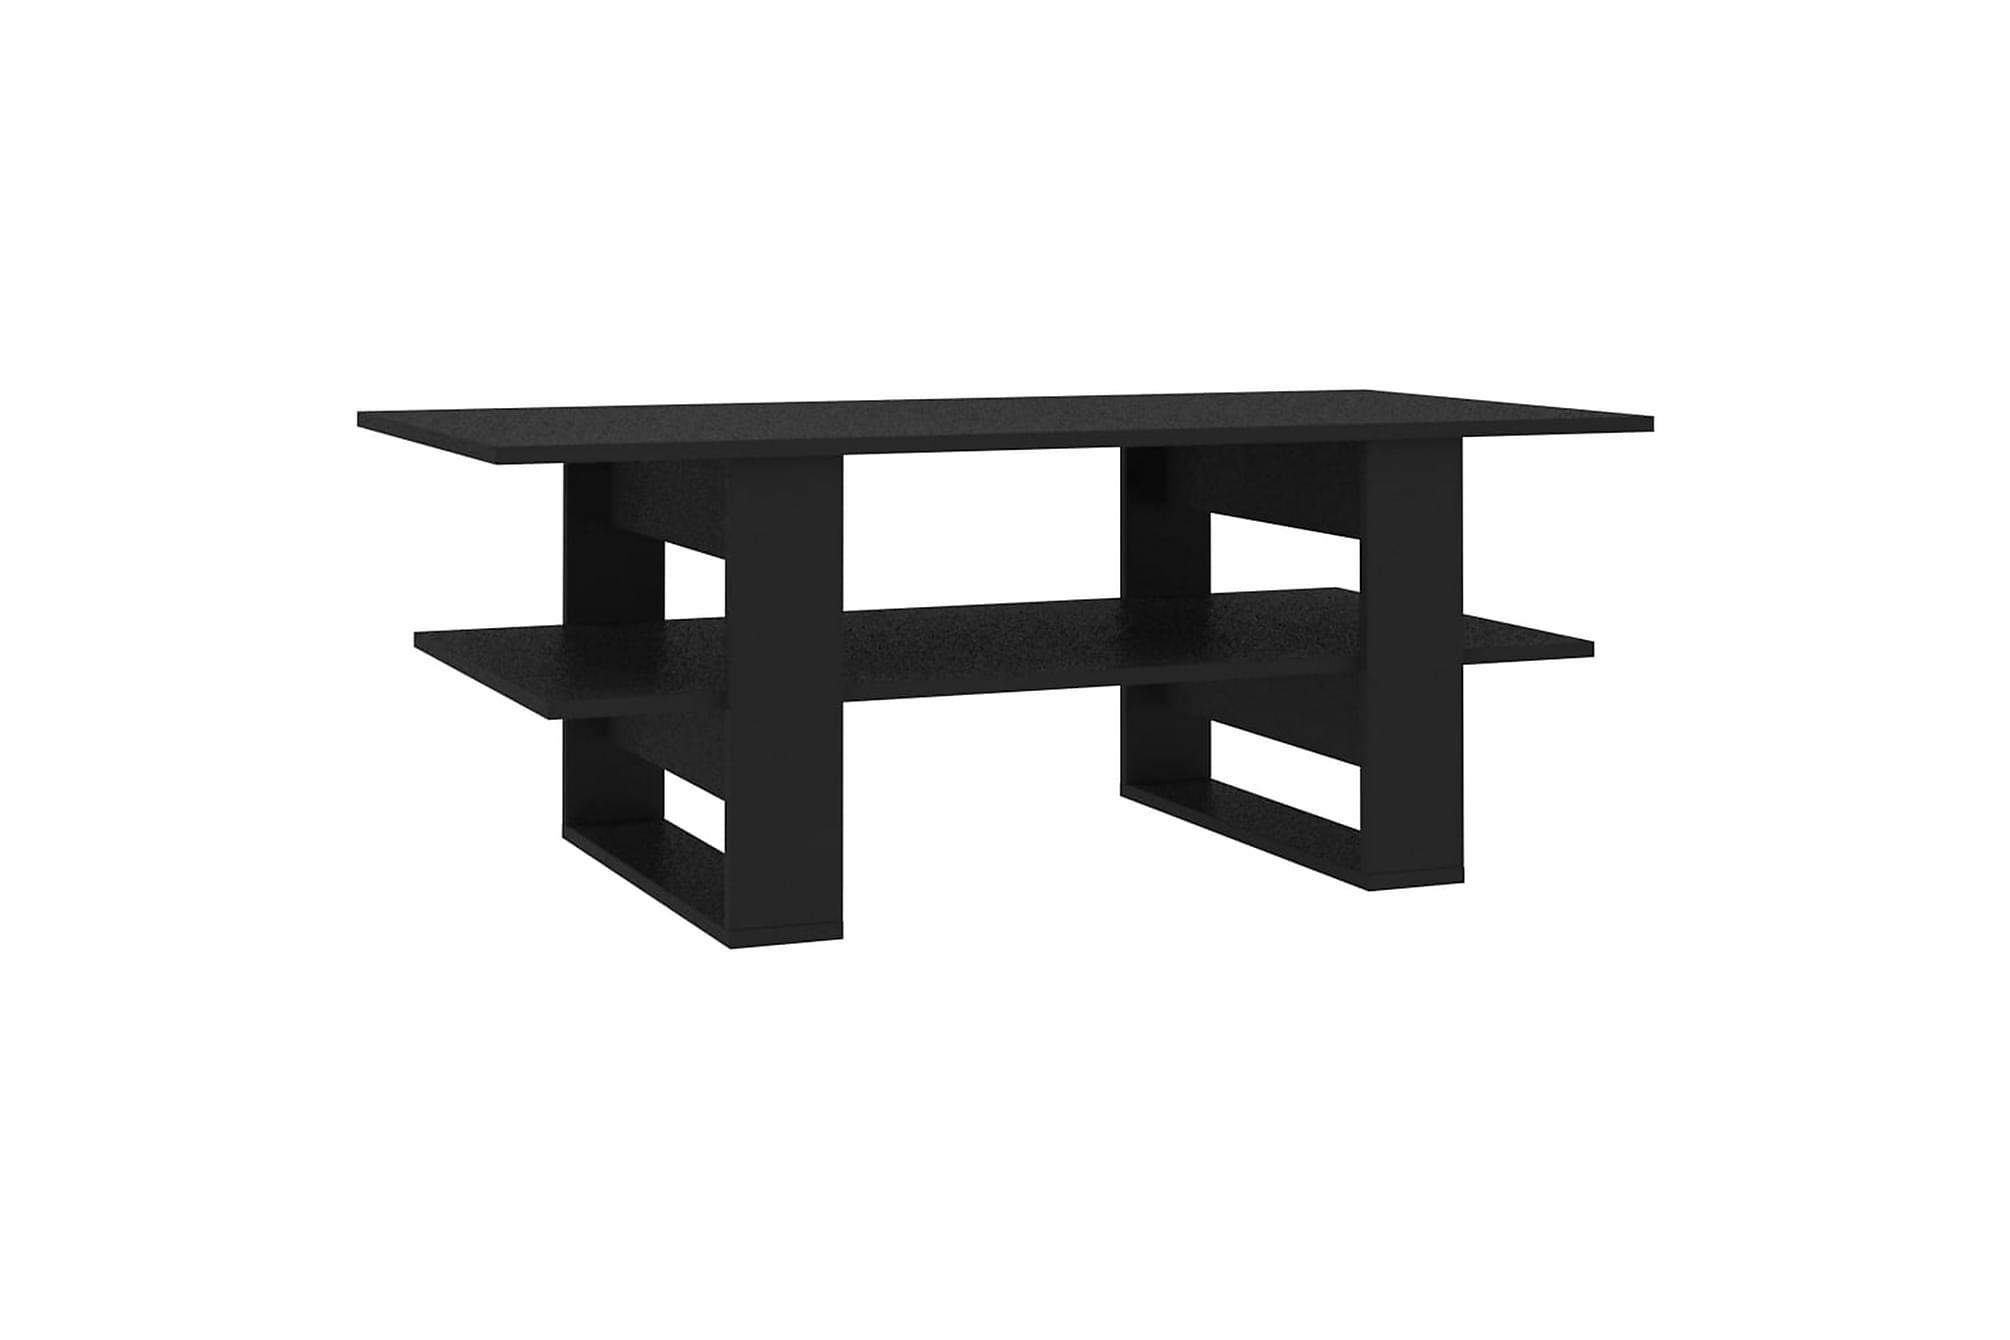 Soffbord svart 110x55x42 cm spånskiva